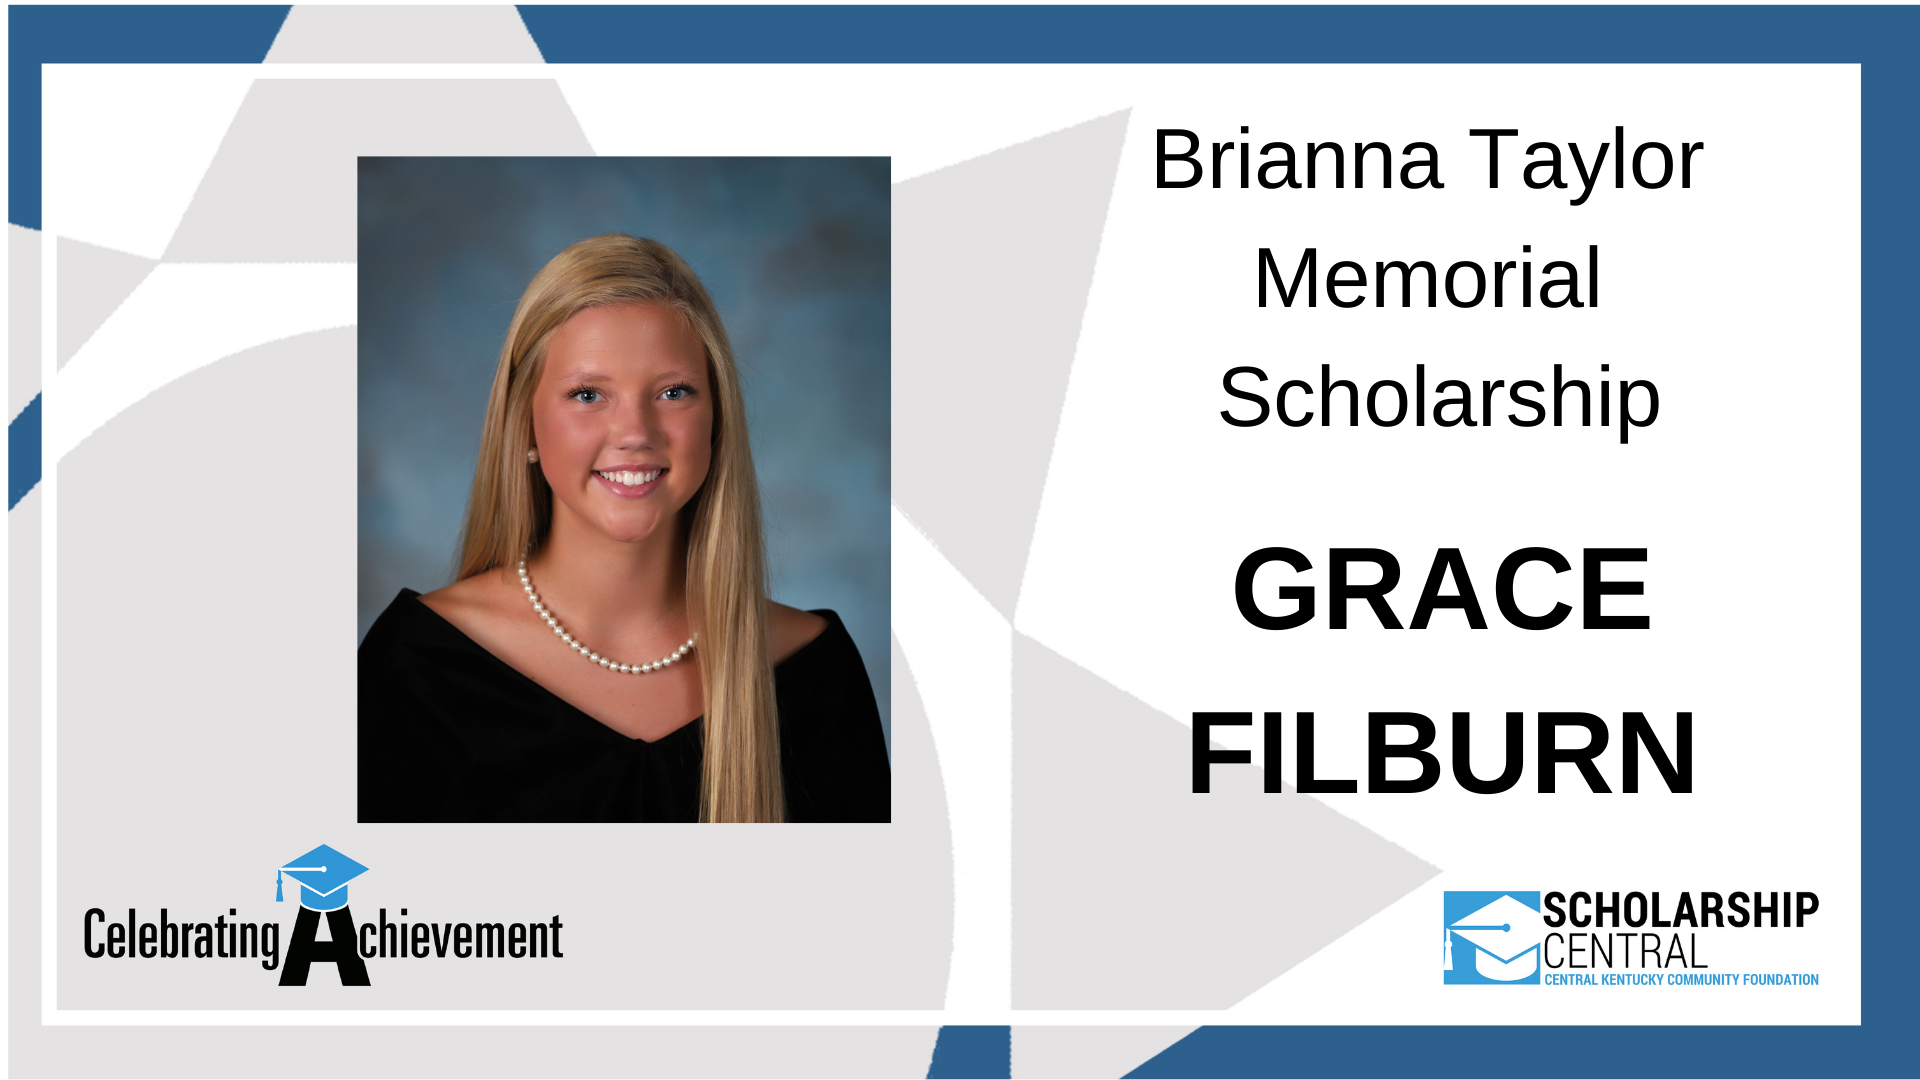 Brianna Taylor Memorial Scholarship